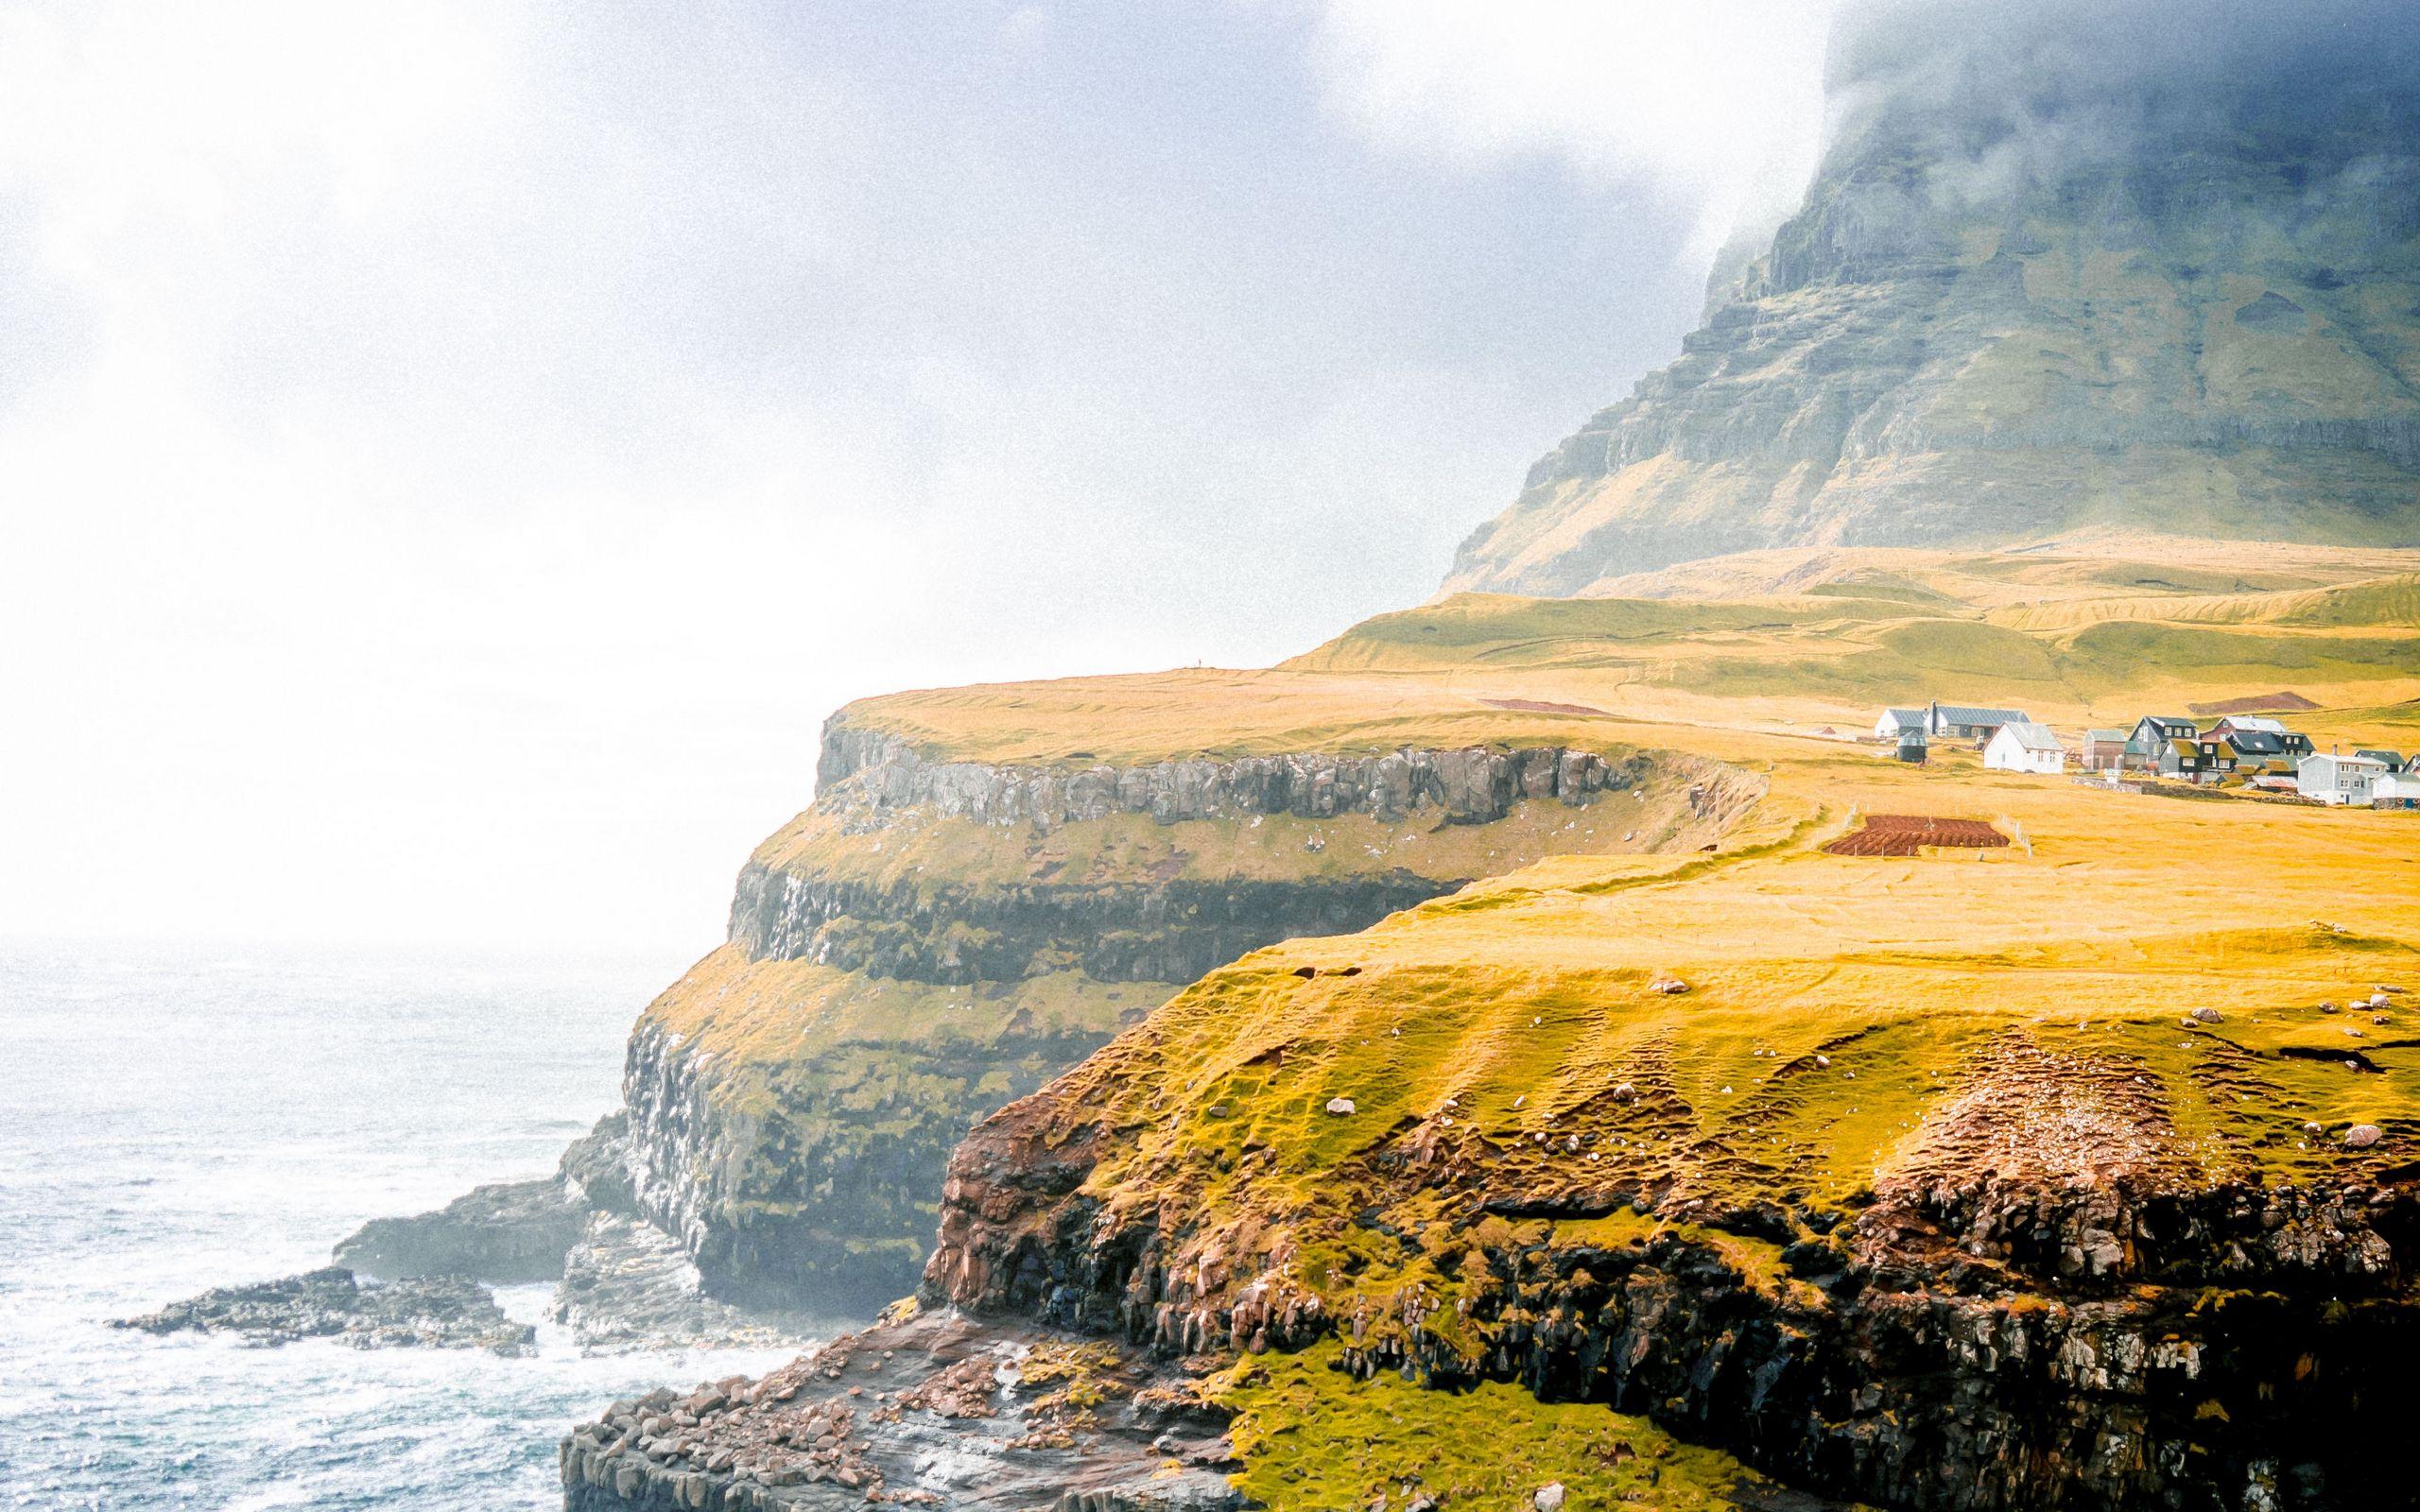 2560x1600 Wallpaper shore, cliff, plain, sea, village, home, greens